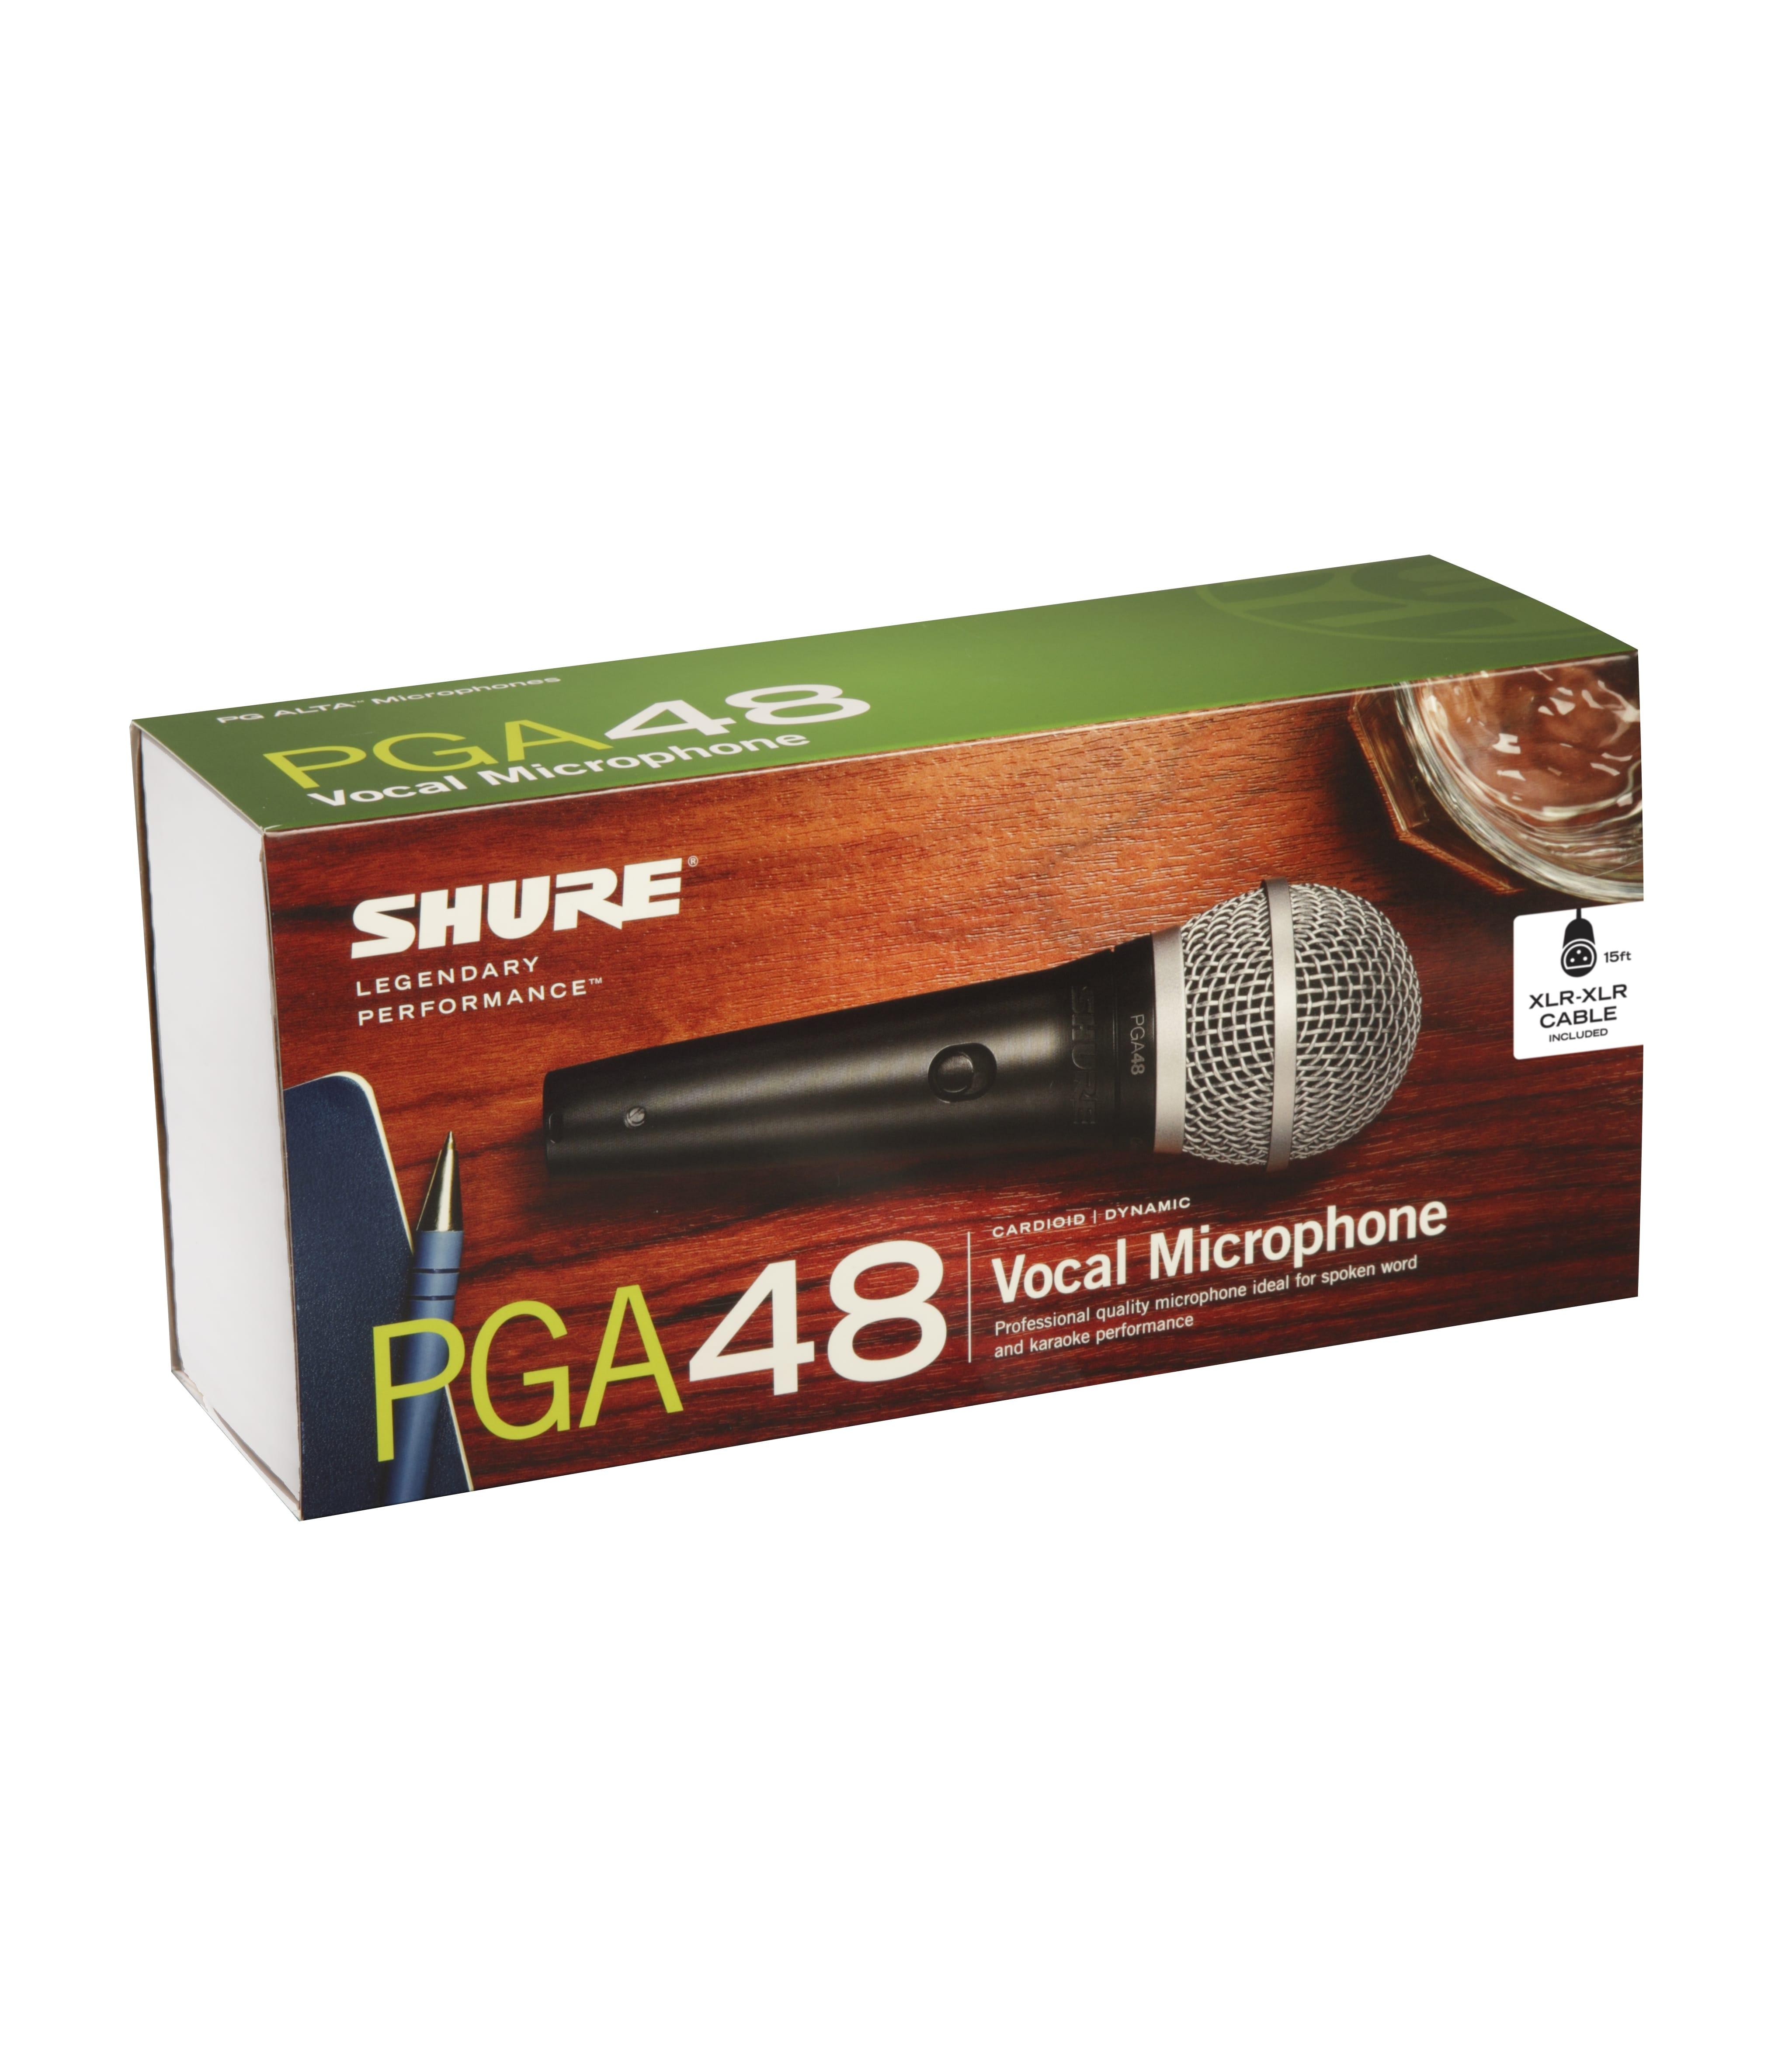 PGA48 XLR E Cardioid Dynamic Vocal Microphone - Buy Online